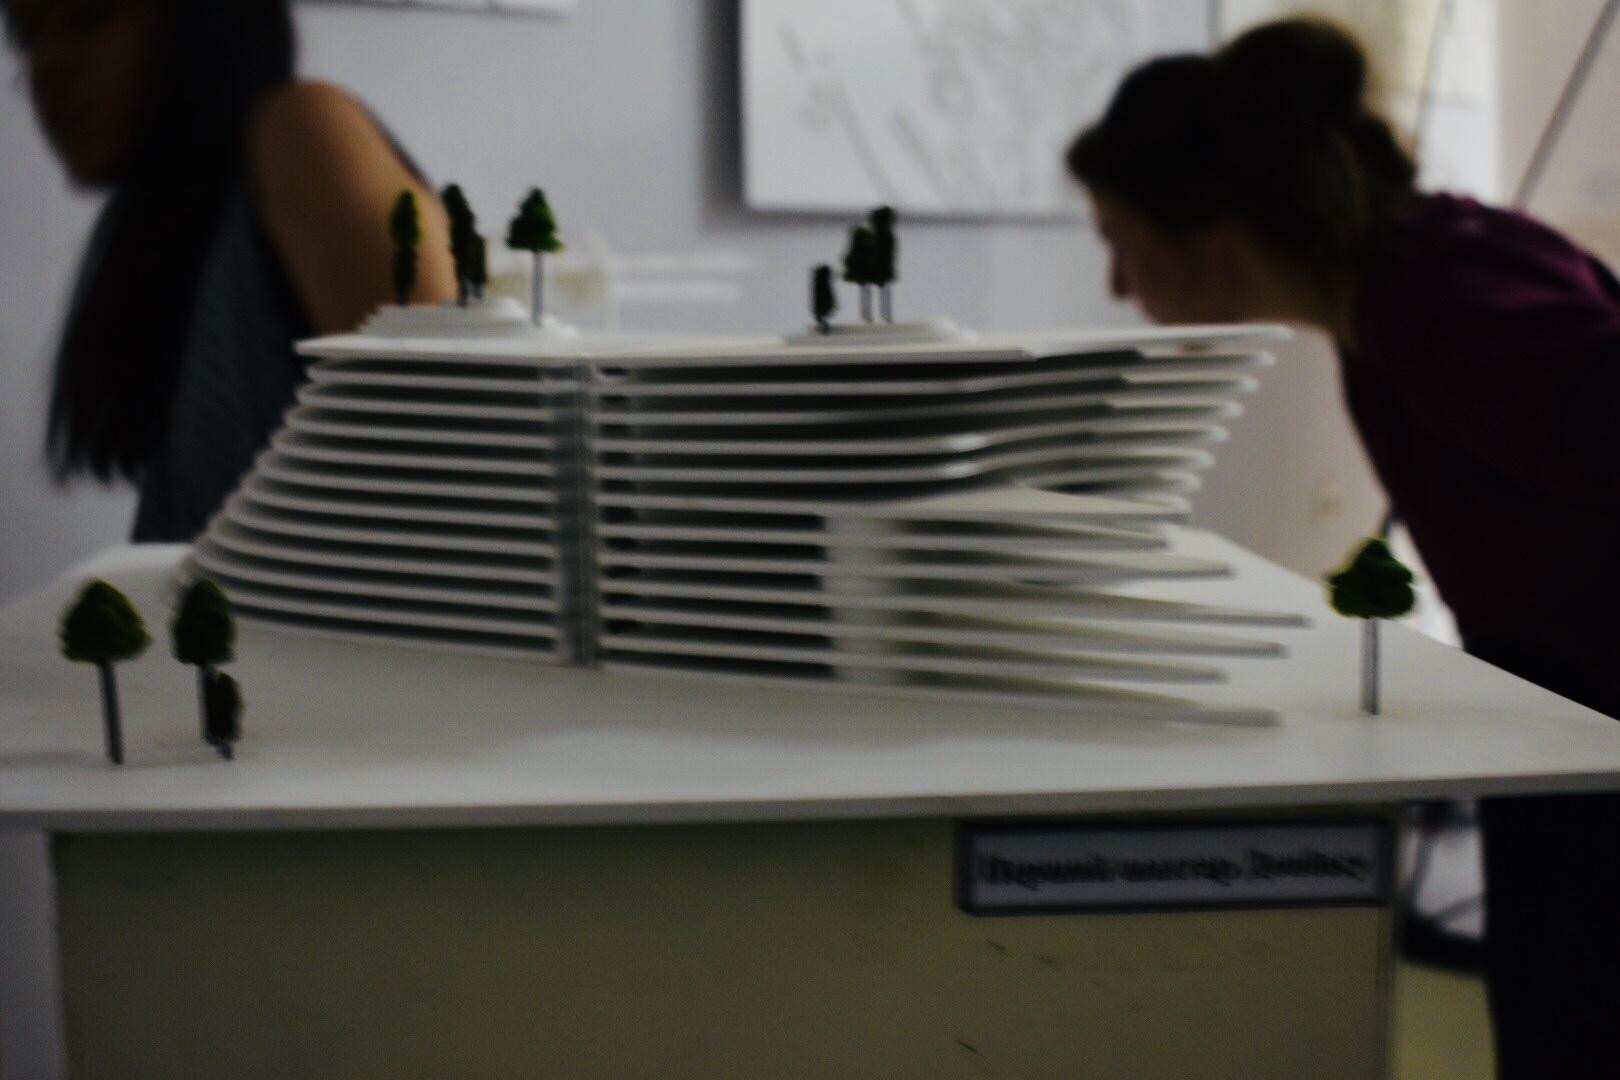 Contemporary art installation re-imagining local architecture, by artist Sasha Dolgiy, Lysychansk Regional Museum